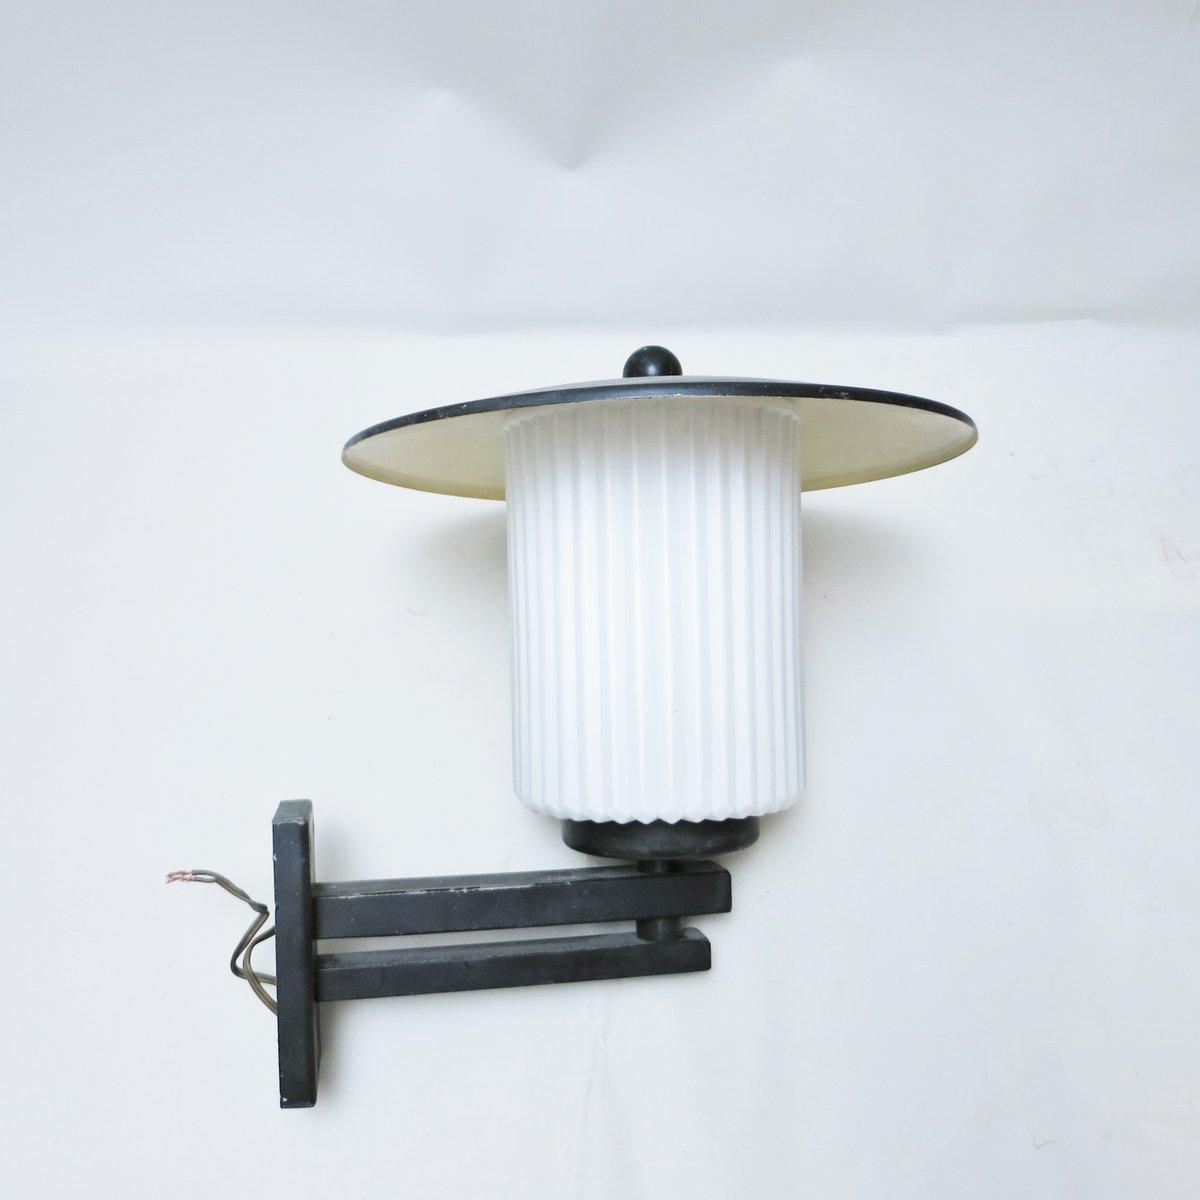 Lampe in Laternenoptik von Lunel, 1950er